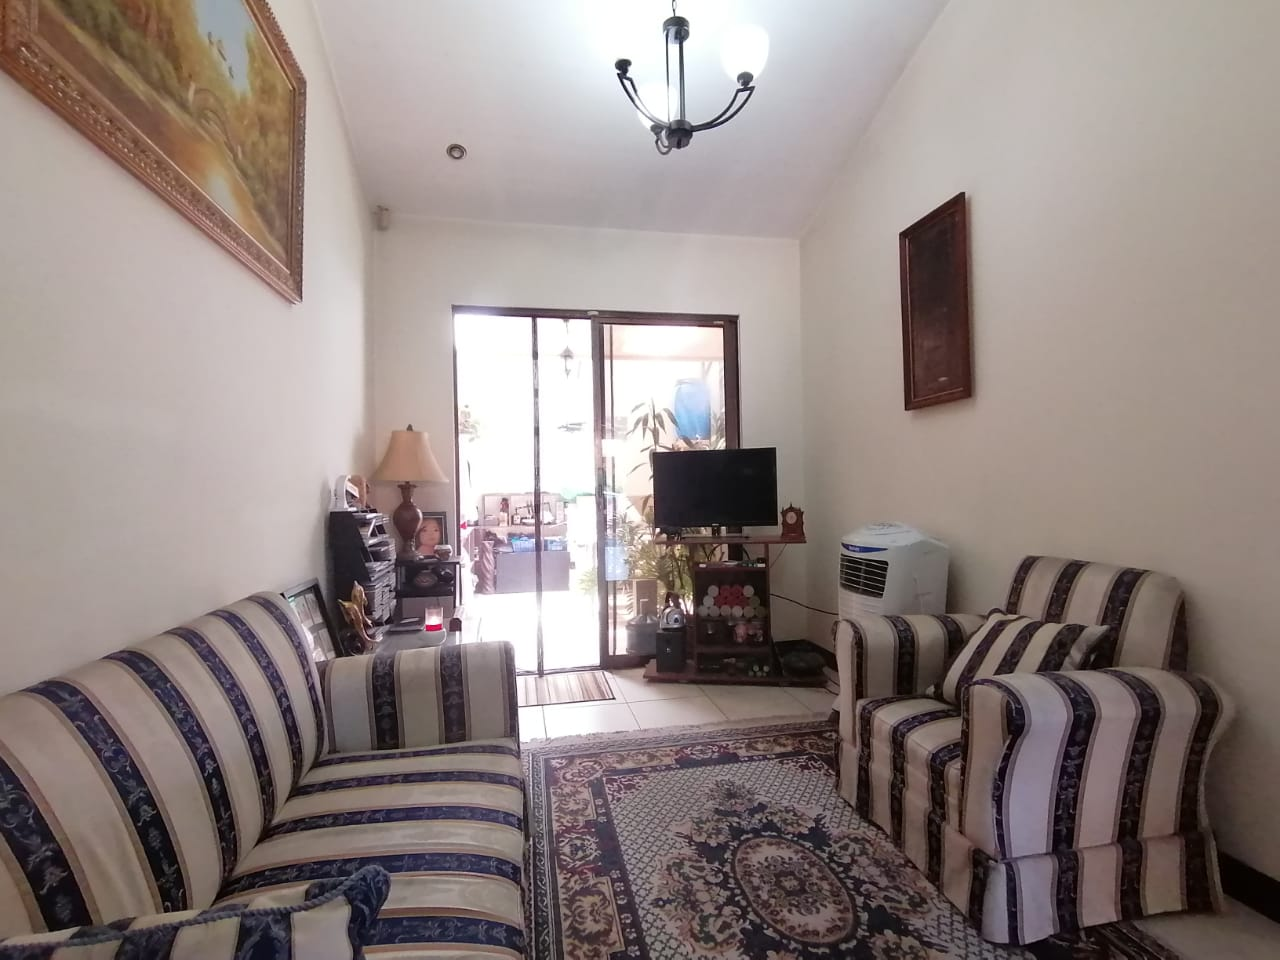 2137 Se Vende condominio en San Agustin Heredia